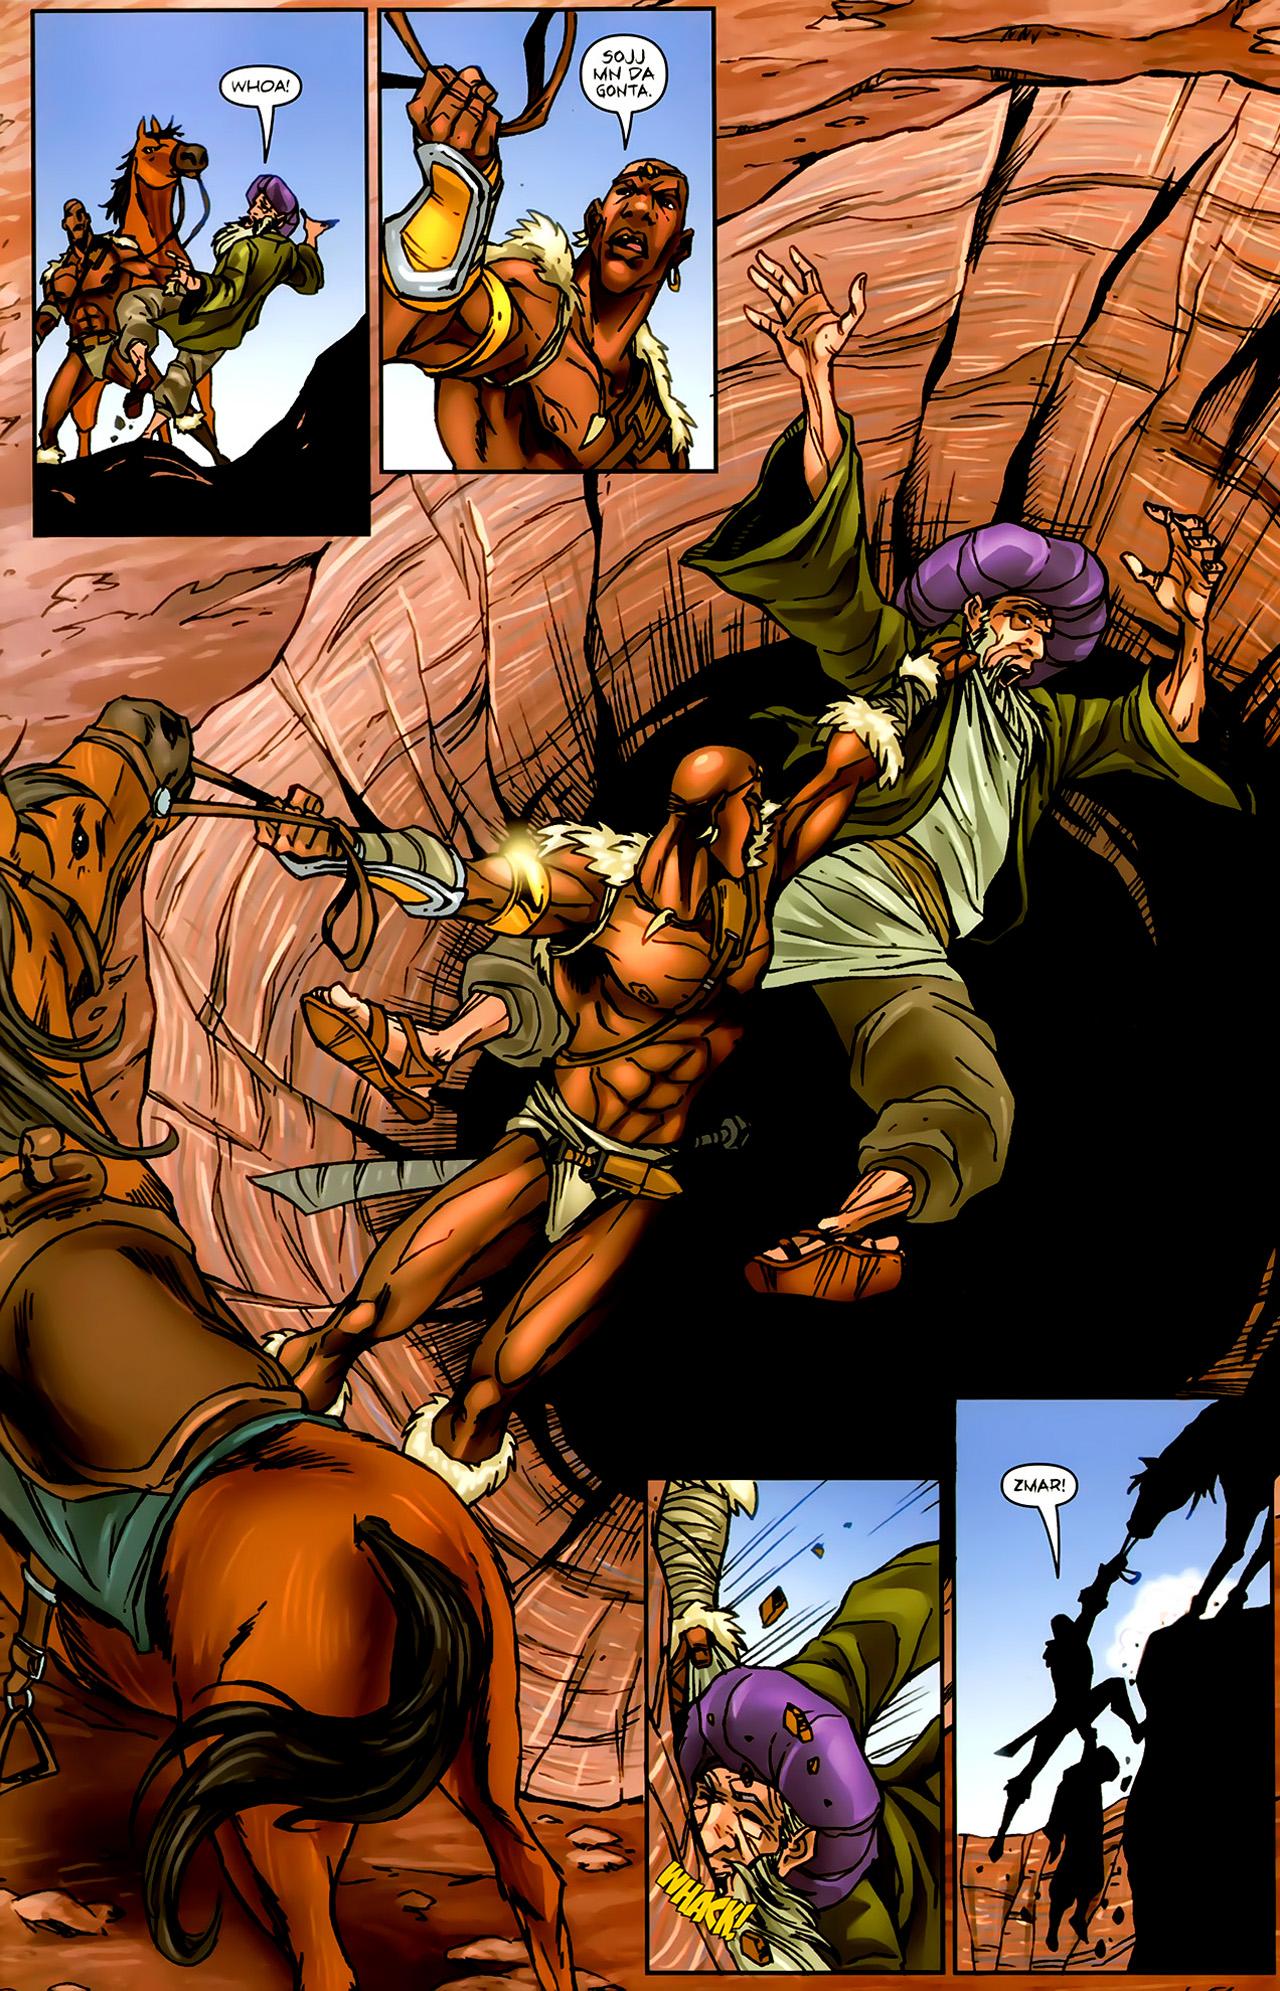 Read online 1001 Arabian Nights: The Adventures of Sinbad comic -  Issue #9 - 23